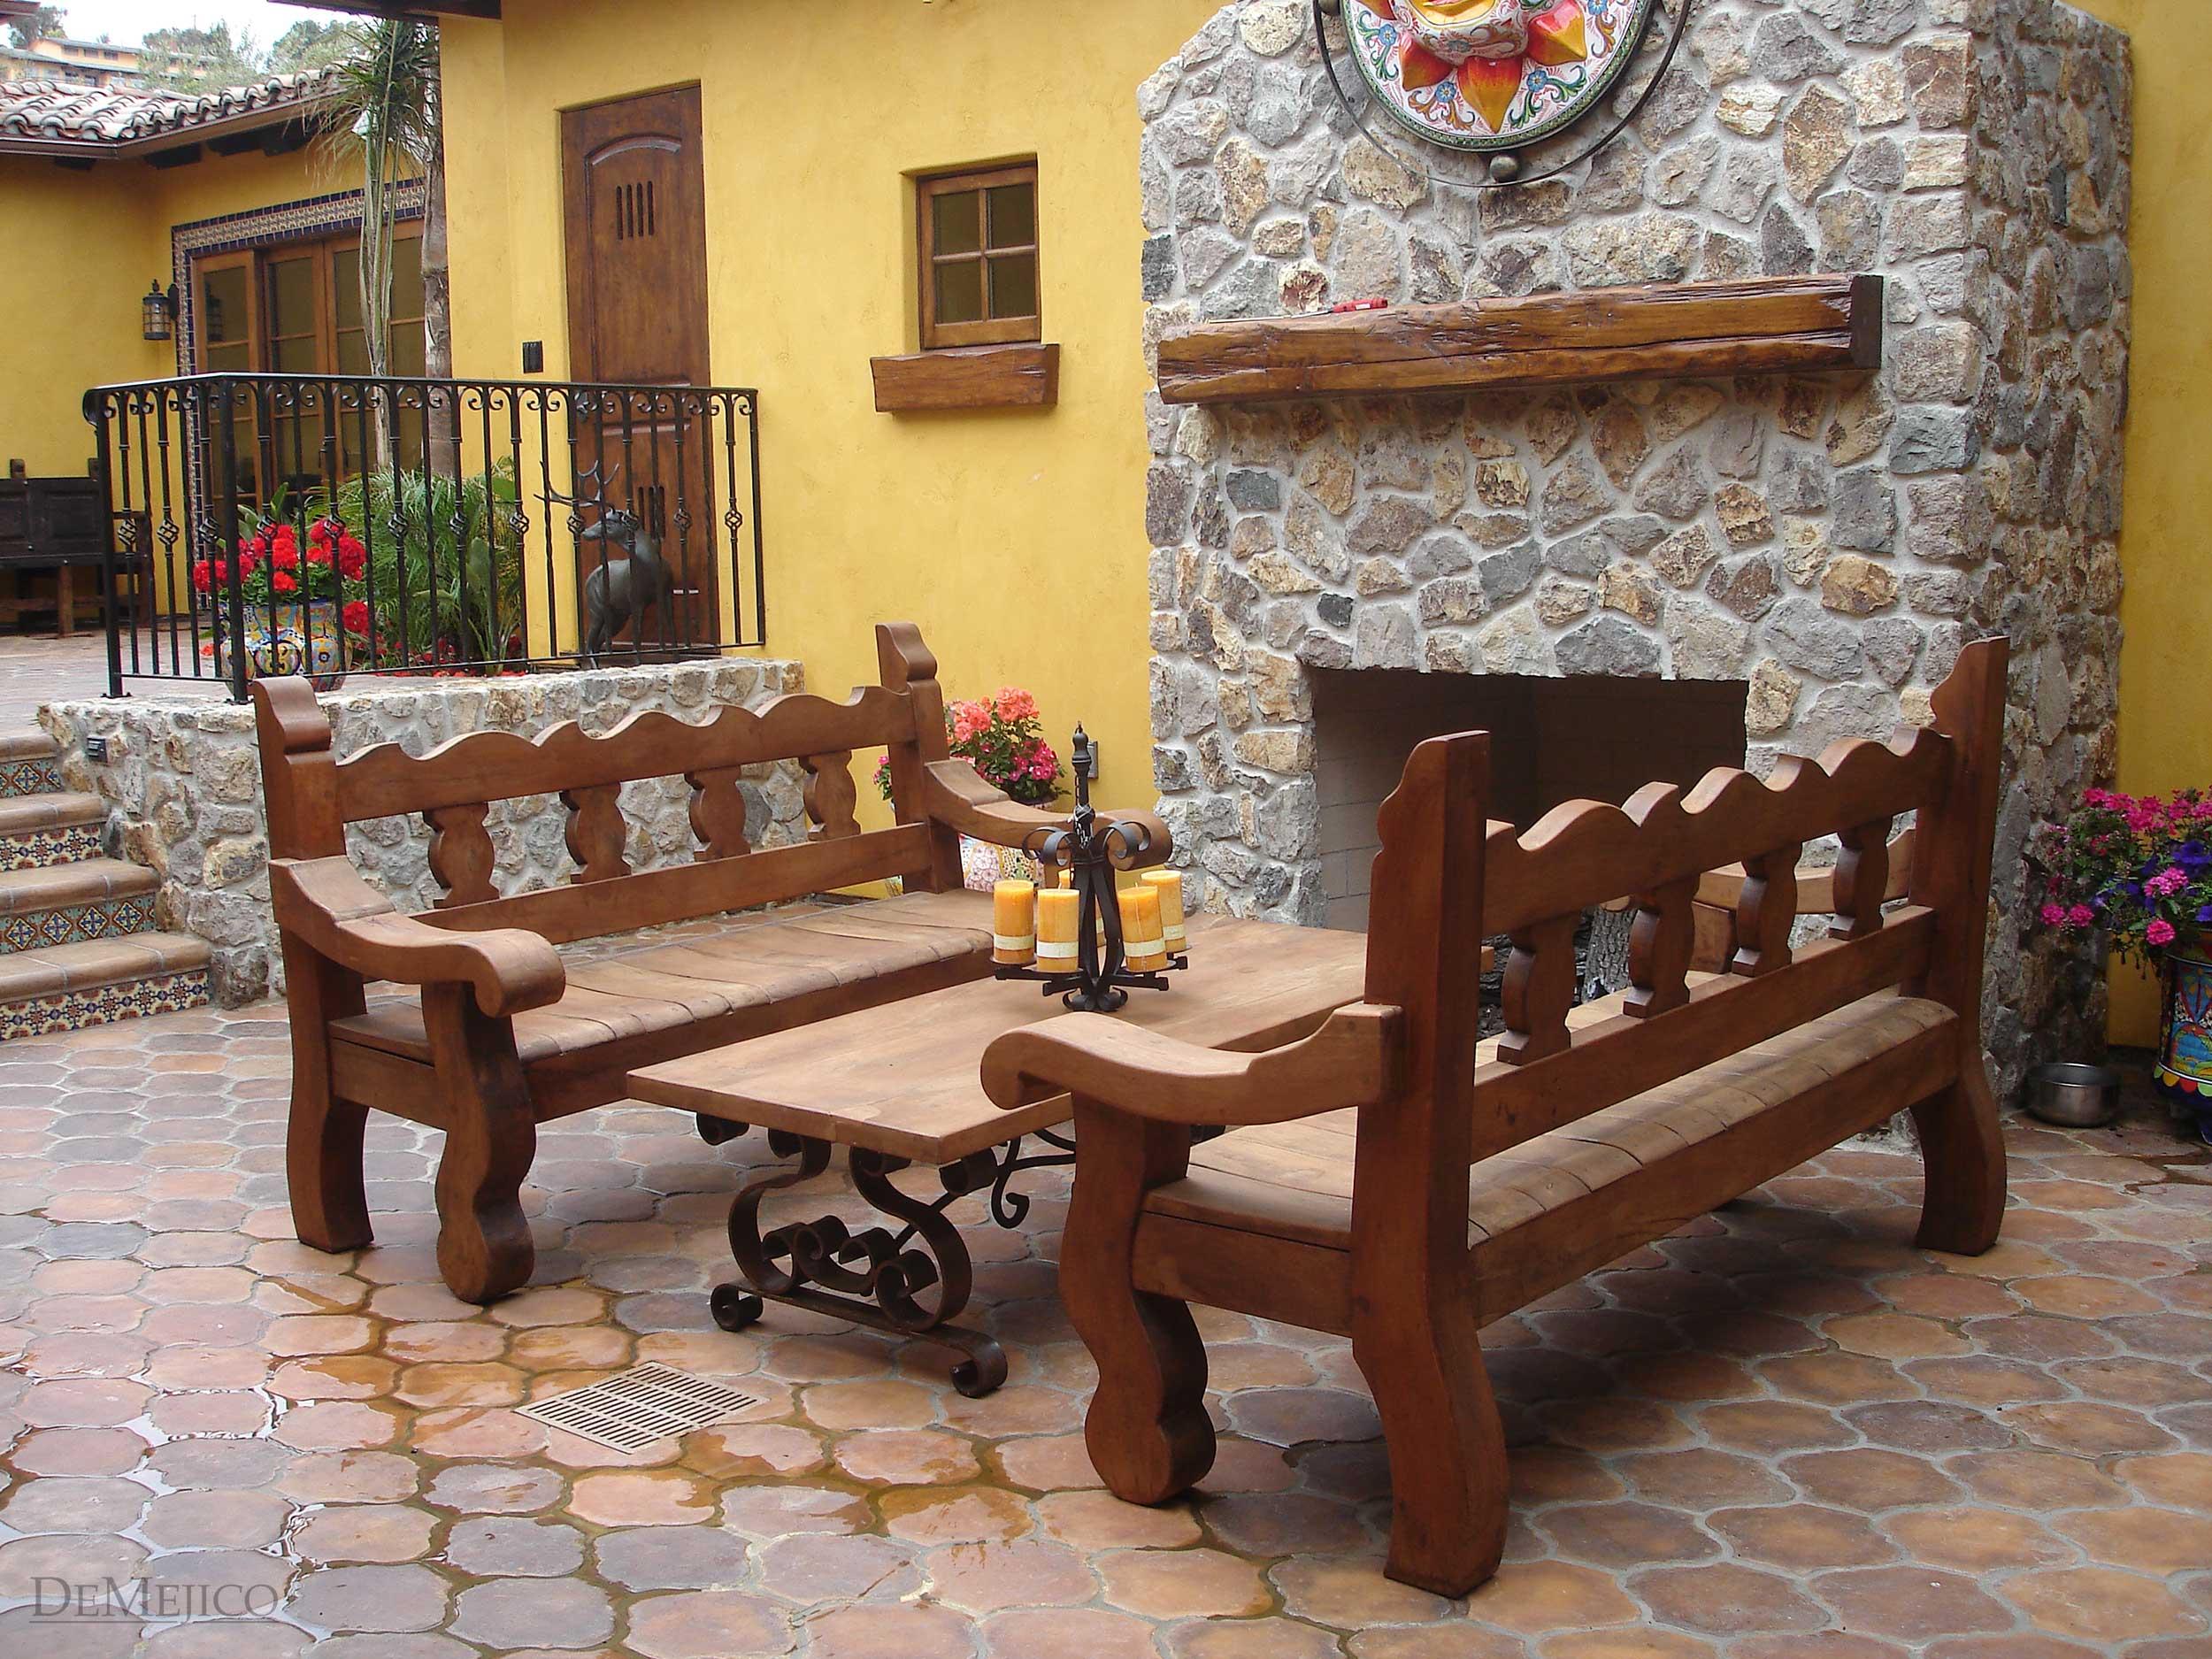 Spanish Furniture, Spanish Outdoor Furniture - Demejico on Mexican Backyard Decor  id=33851